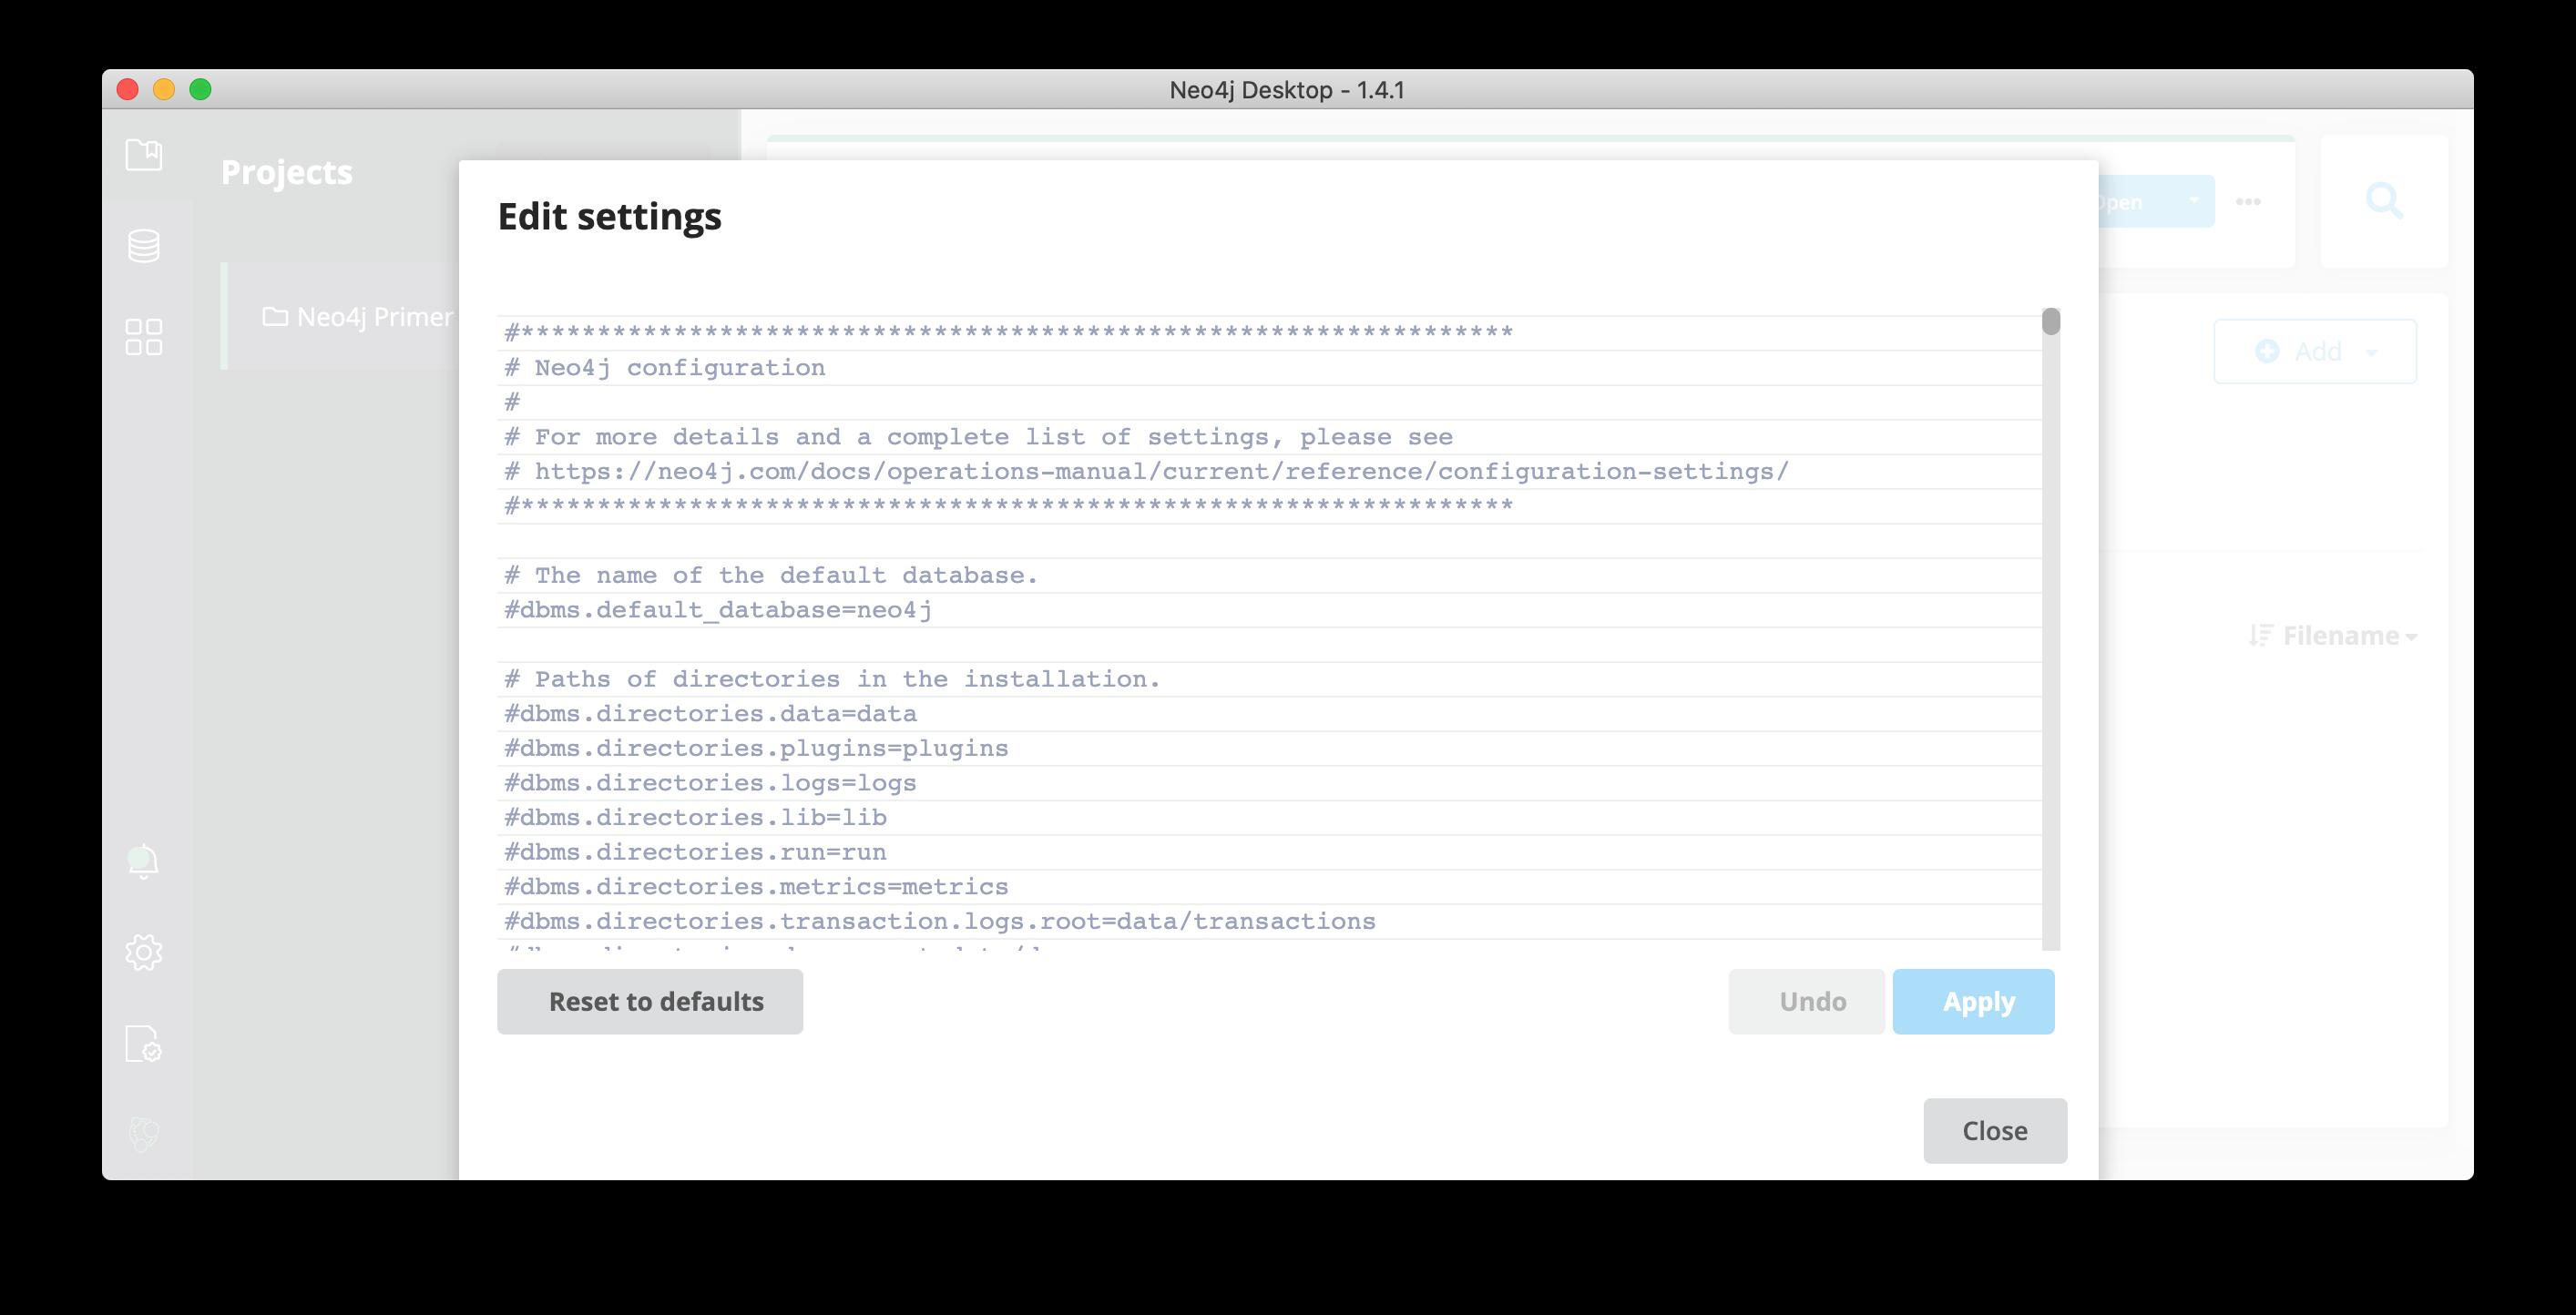 generic edit DBMS settings